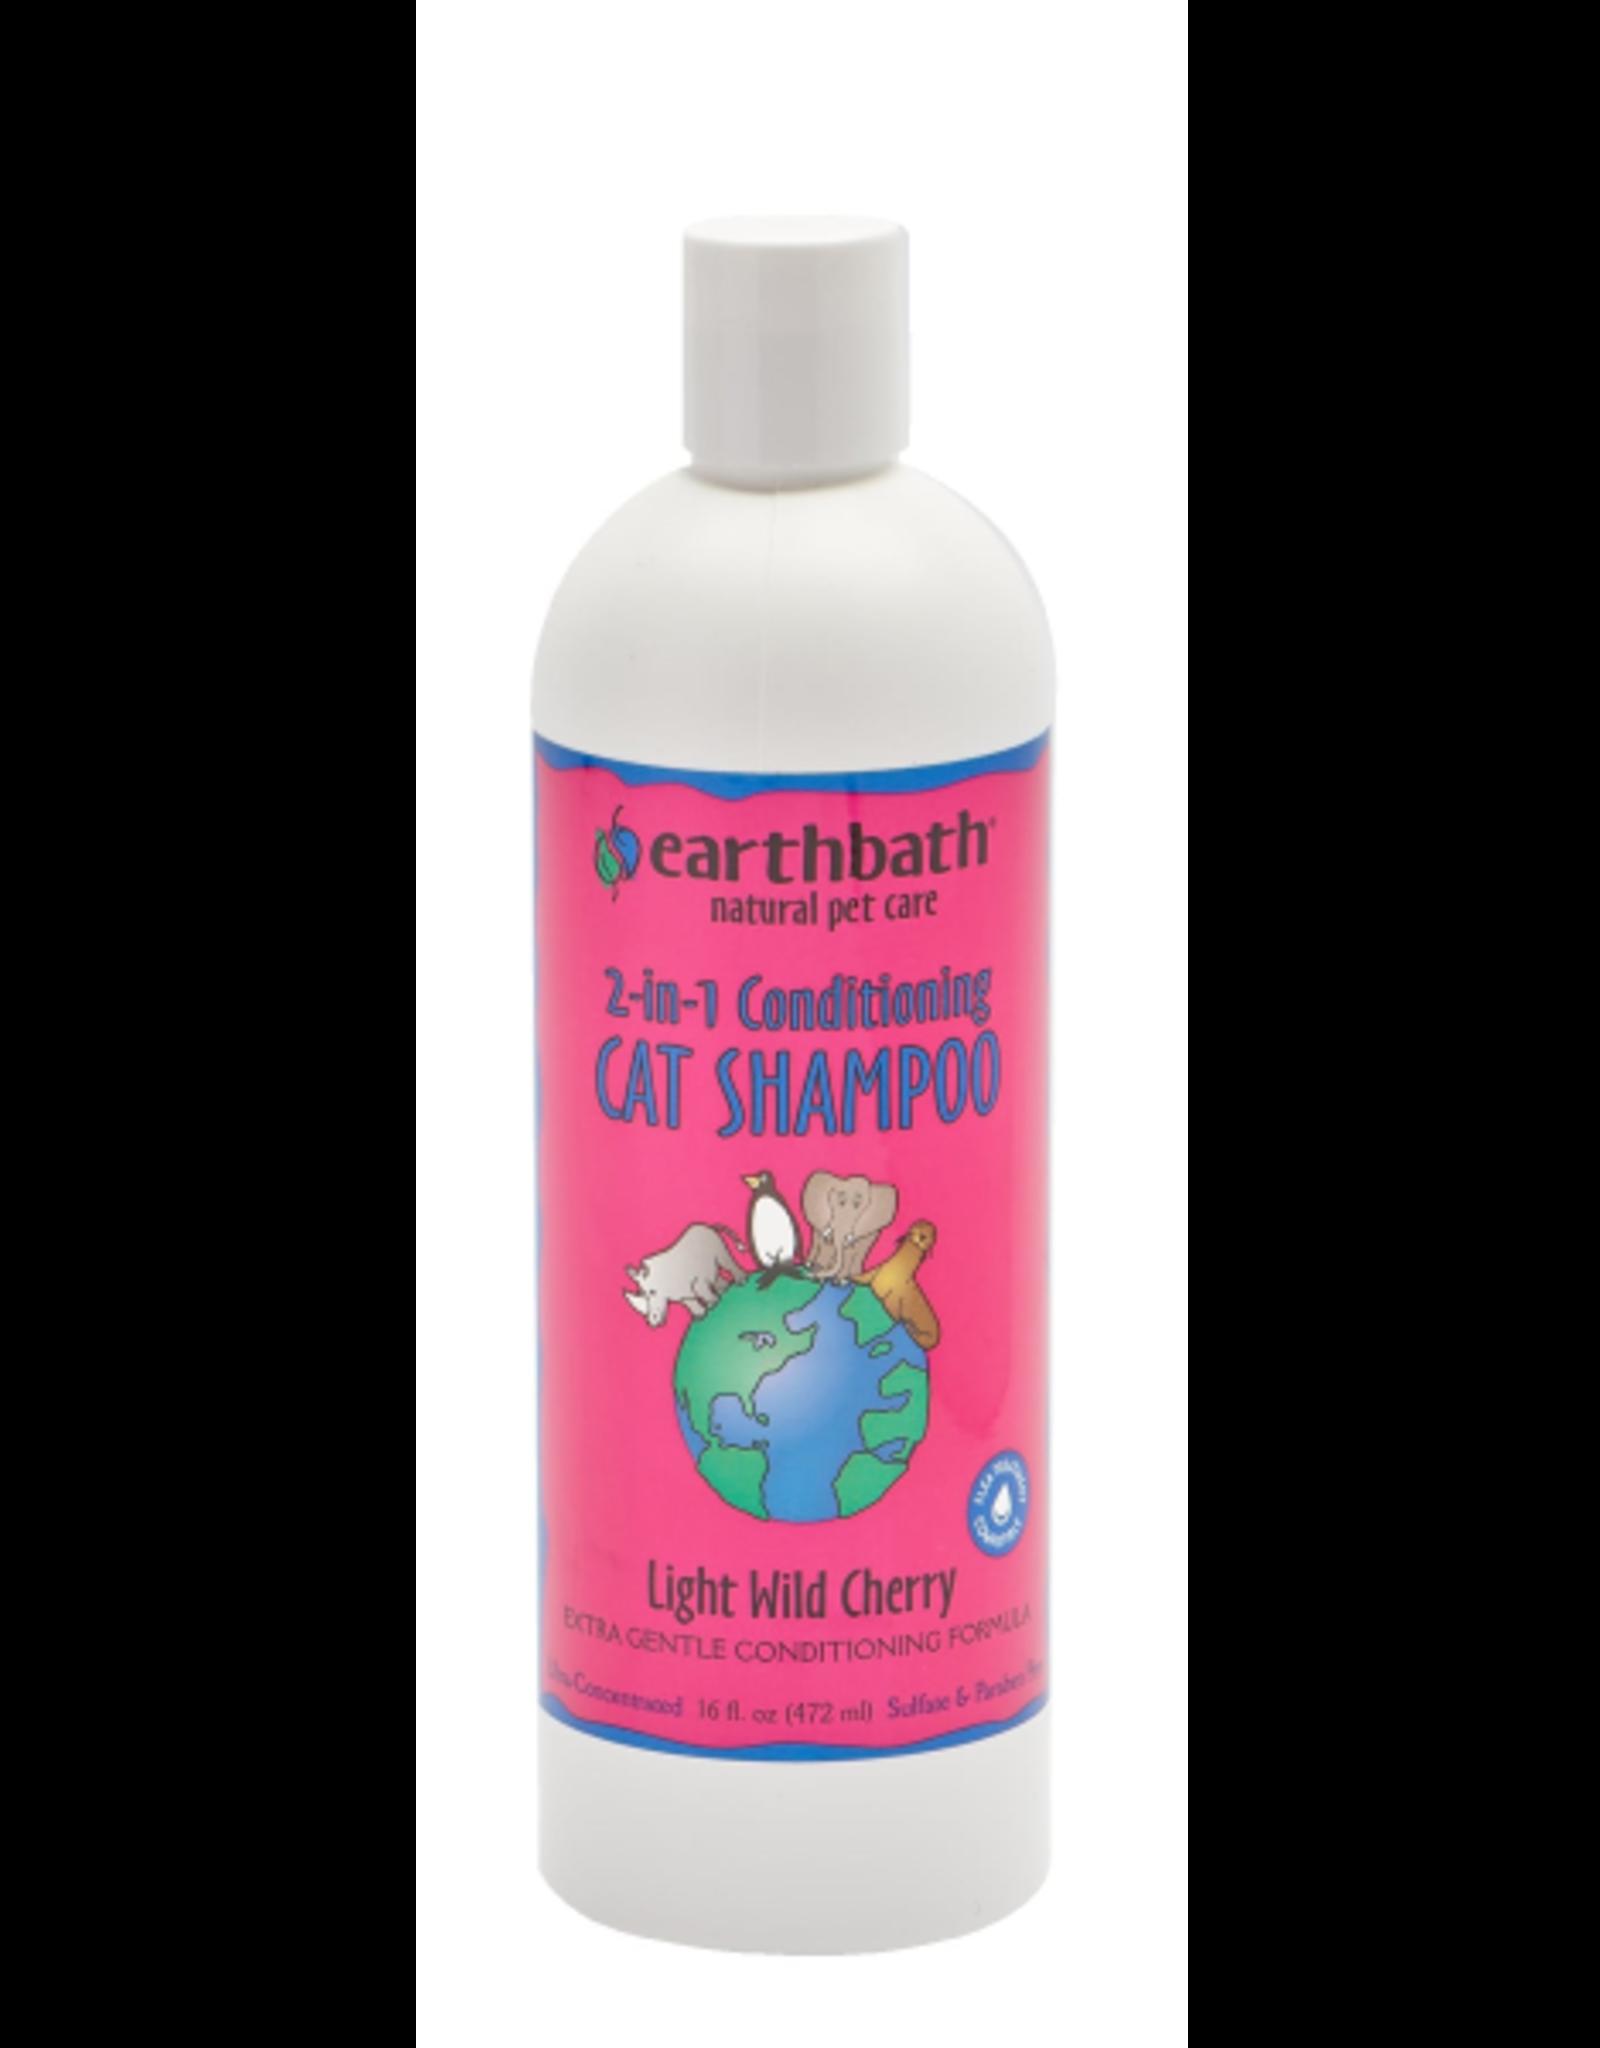 EARTH BATH earthbath 2-in-1 Cond. Cat Shampoo Wild Cherry 16 oz